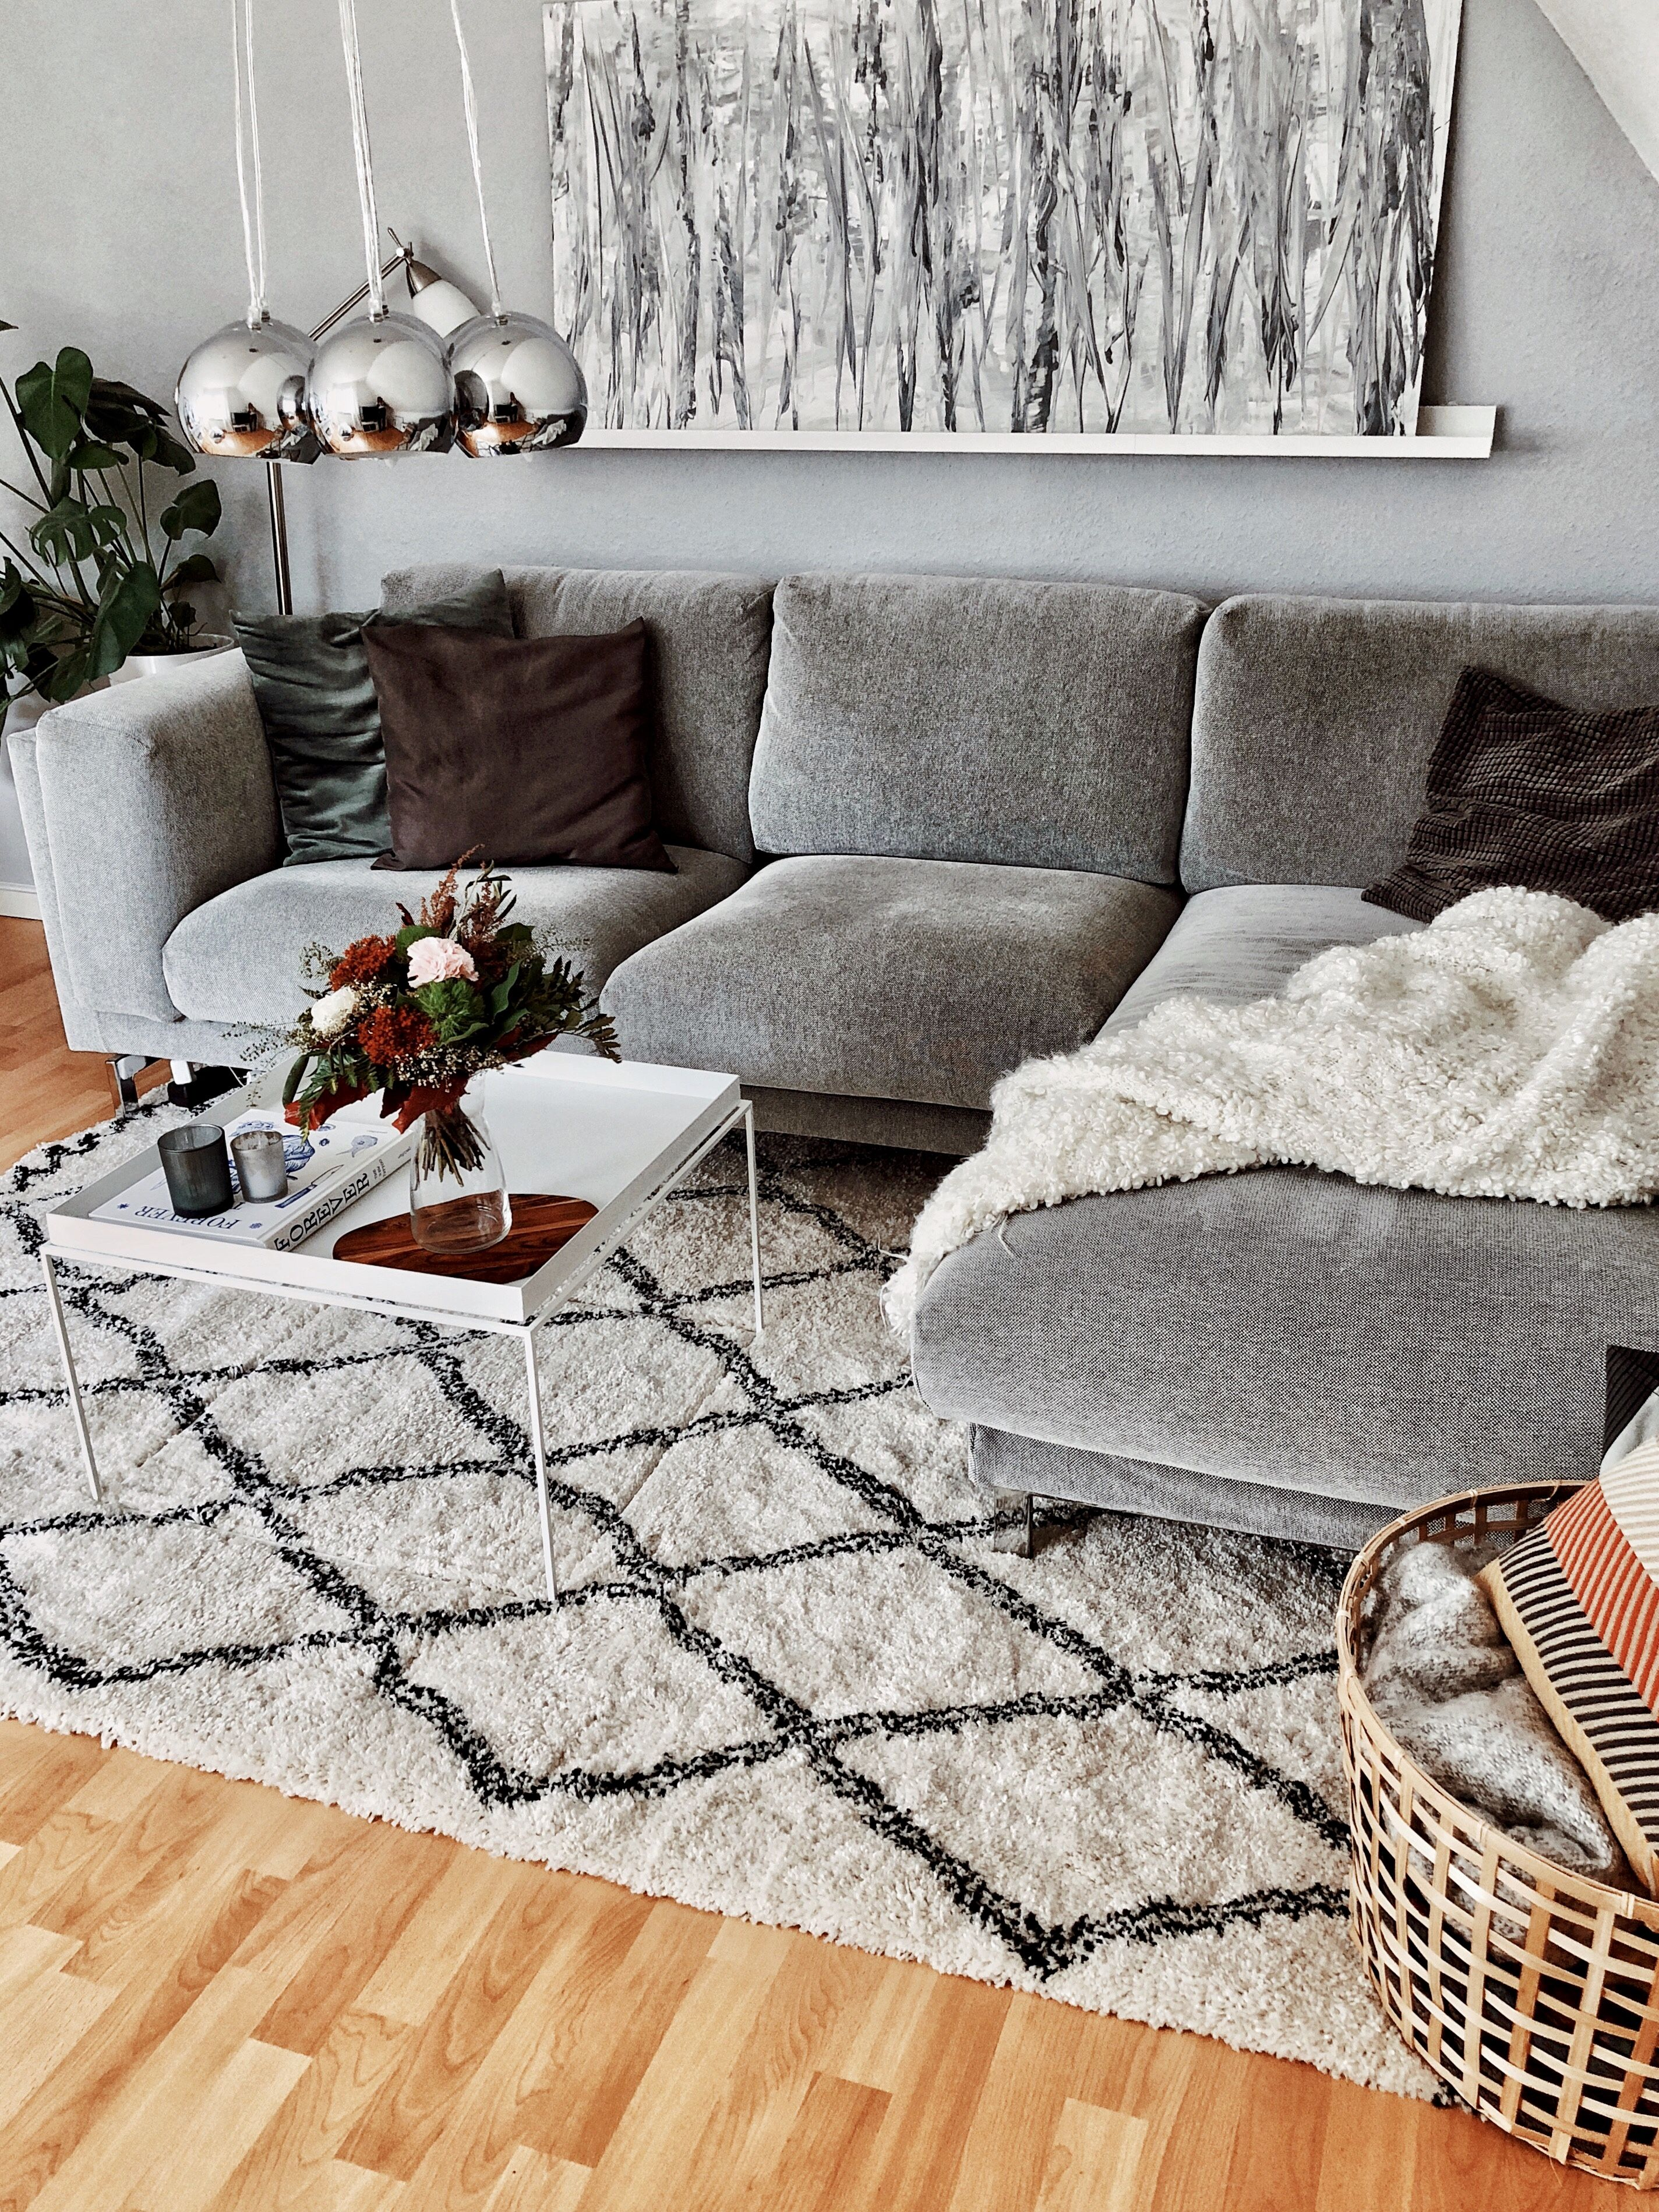 wohnzimmer modern ikea : Wohnzimmer Ikea Livingroom Hay Hay Tray Table Hay Tray Table